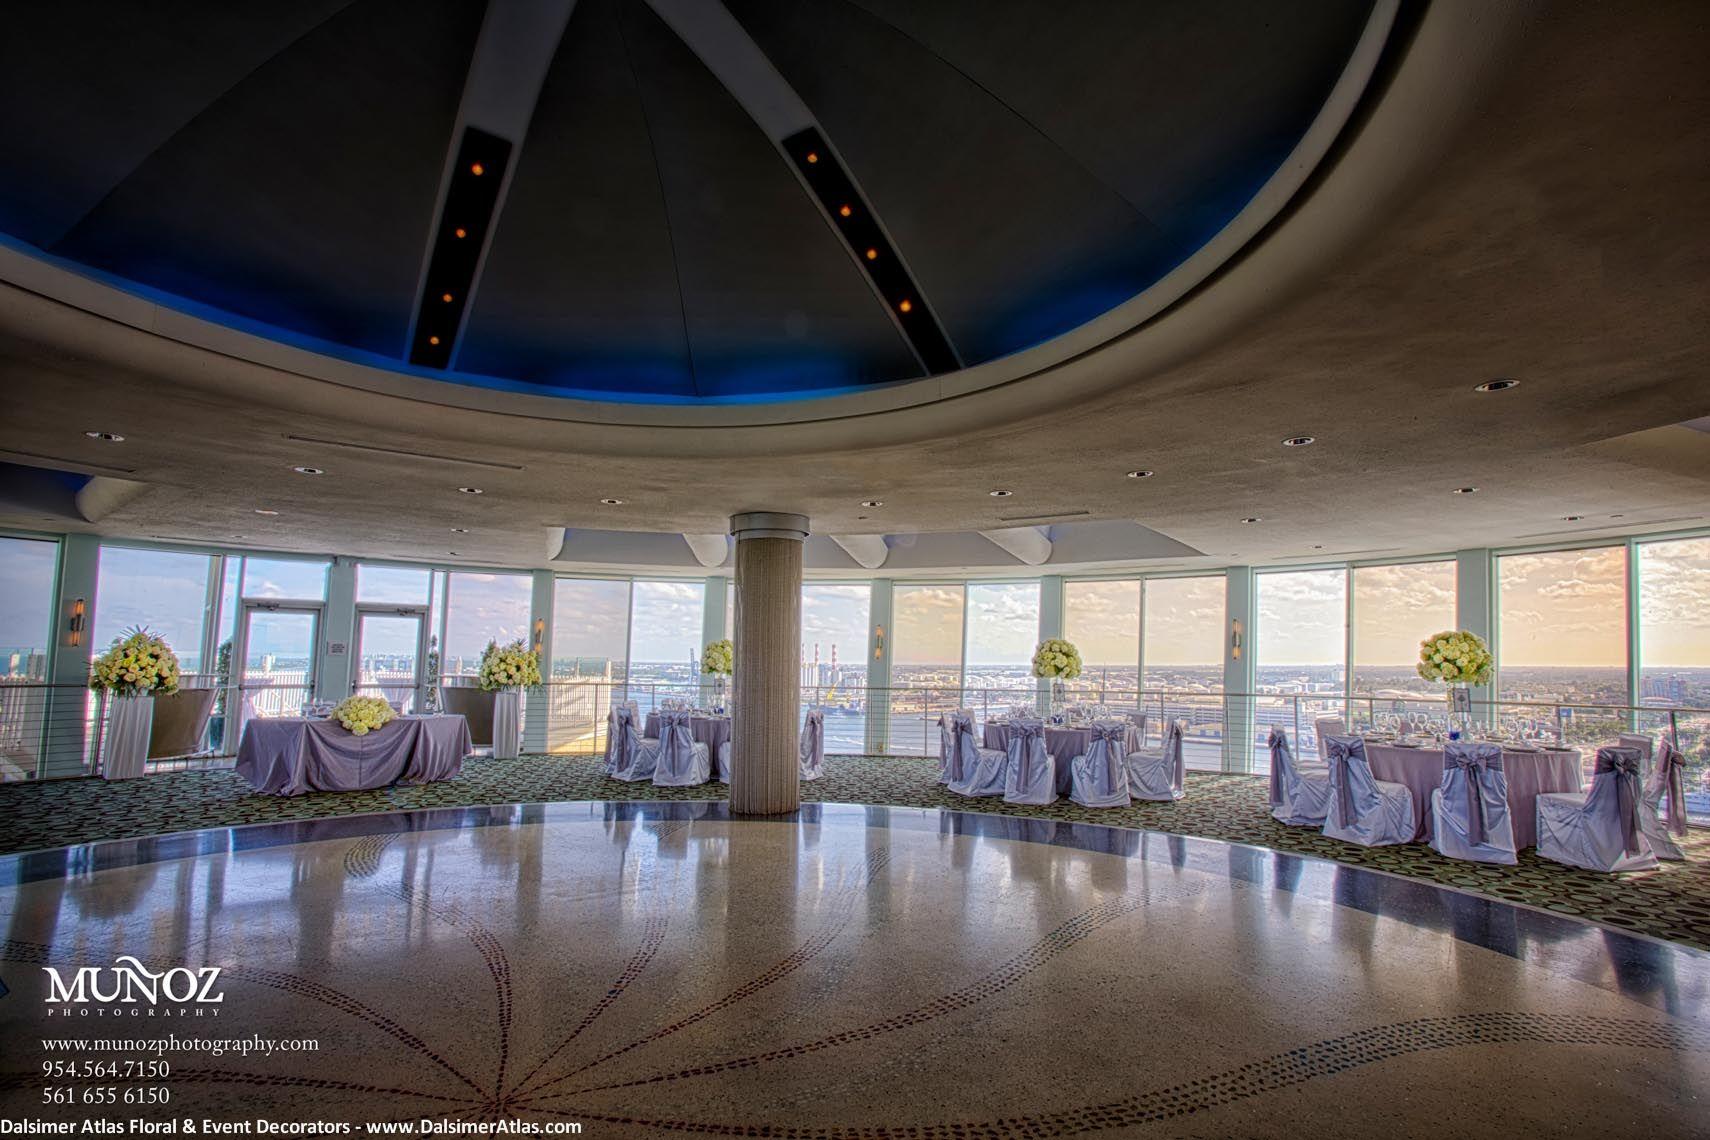 Hyatt Regency Pier Sixty Six Fort Lauderdale Florida 51 Wedding Flowers Bat Bar Mitzvah Themes Dalsimer Atlas Dance Floor With A View